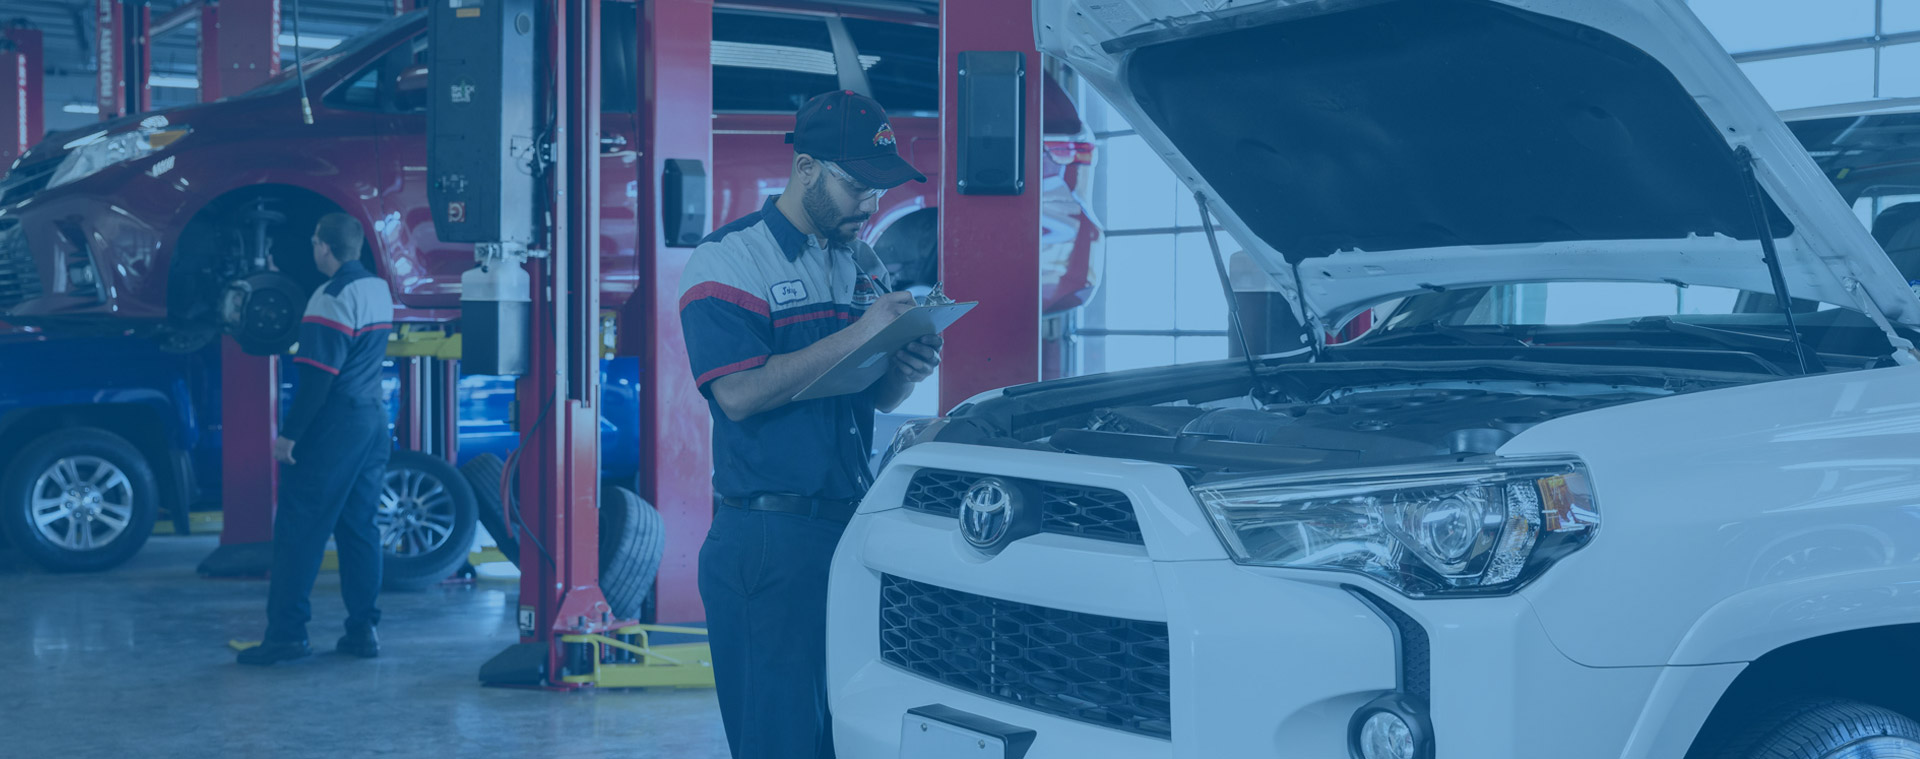 brakes plus vehicle inspection